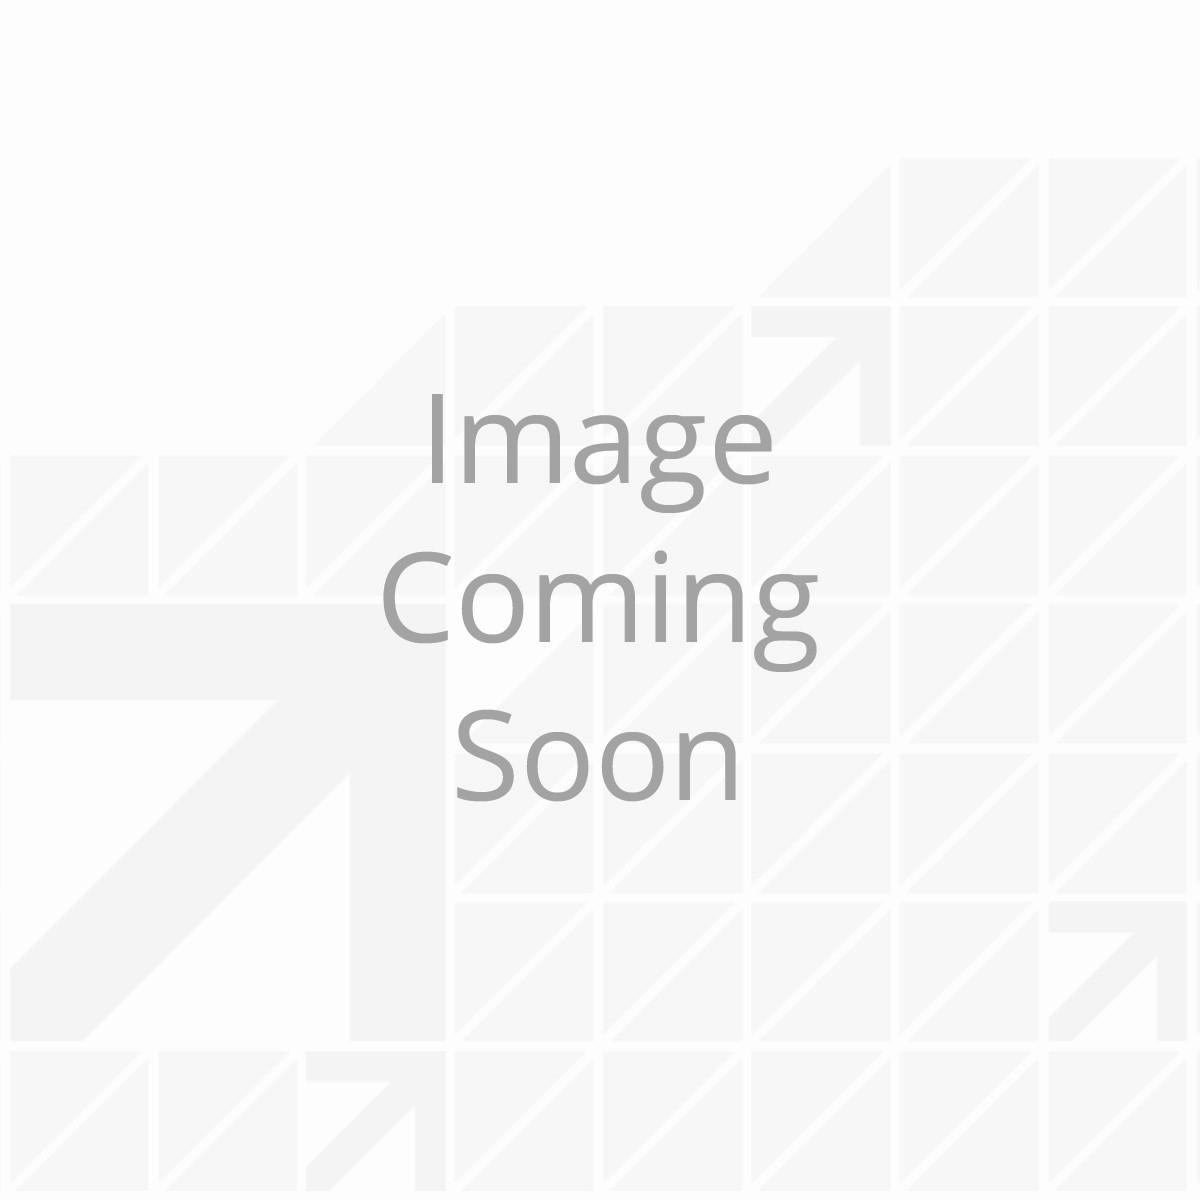 14' Power & Hybrid Awning Roller Assembly - Prepflex Solid Black